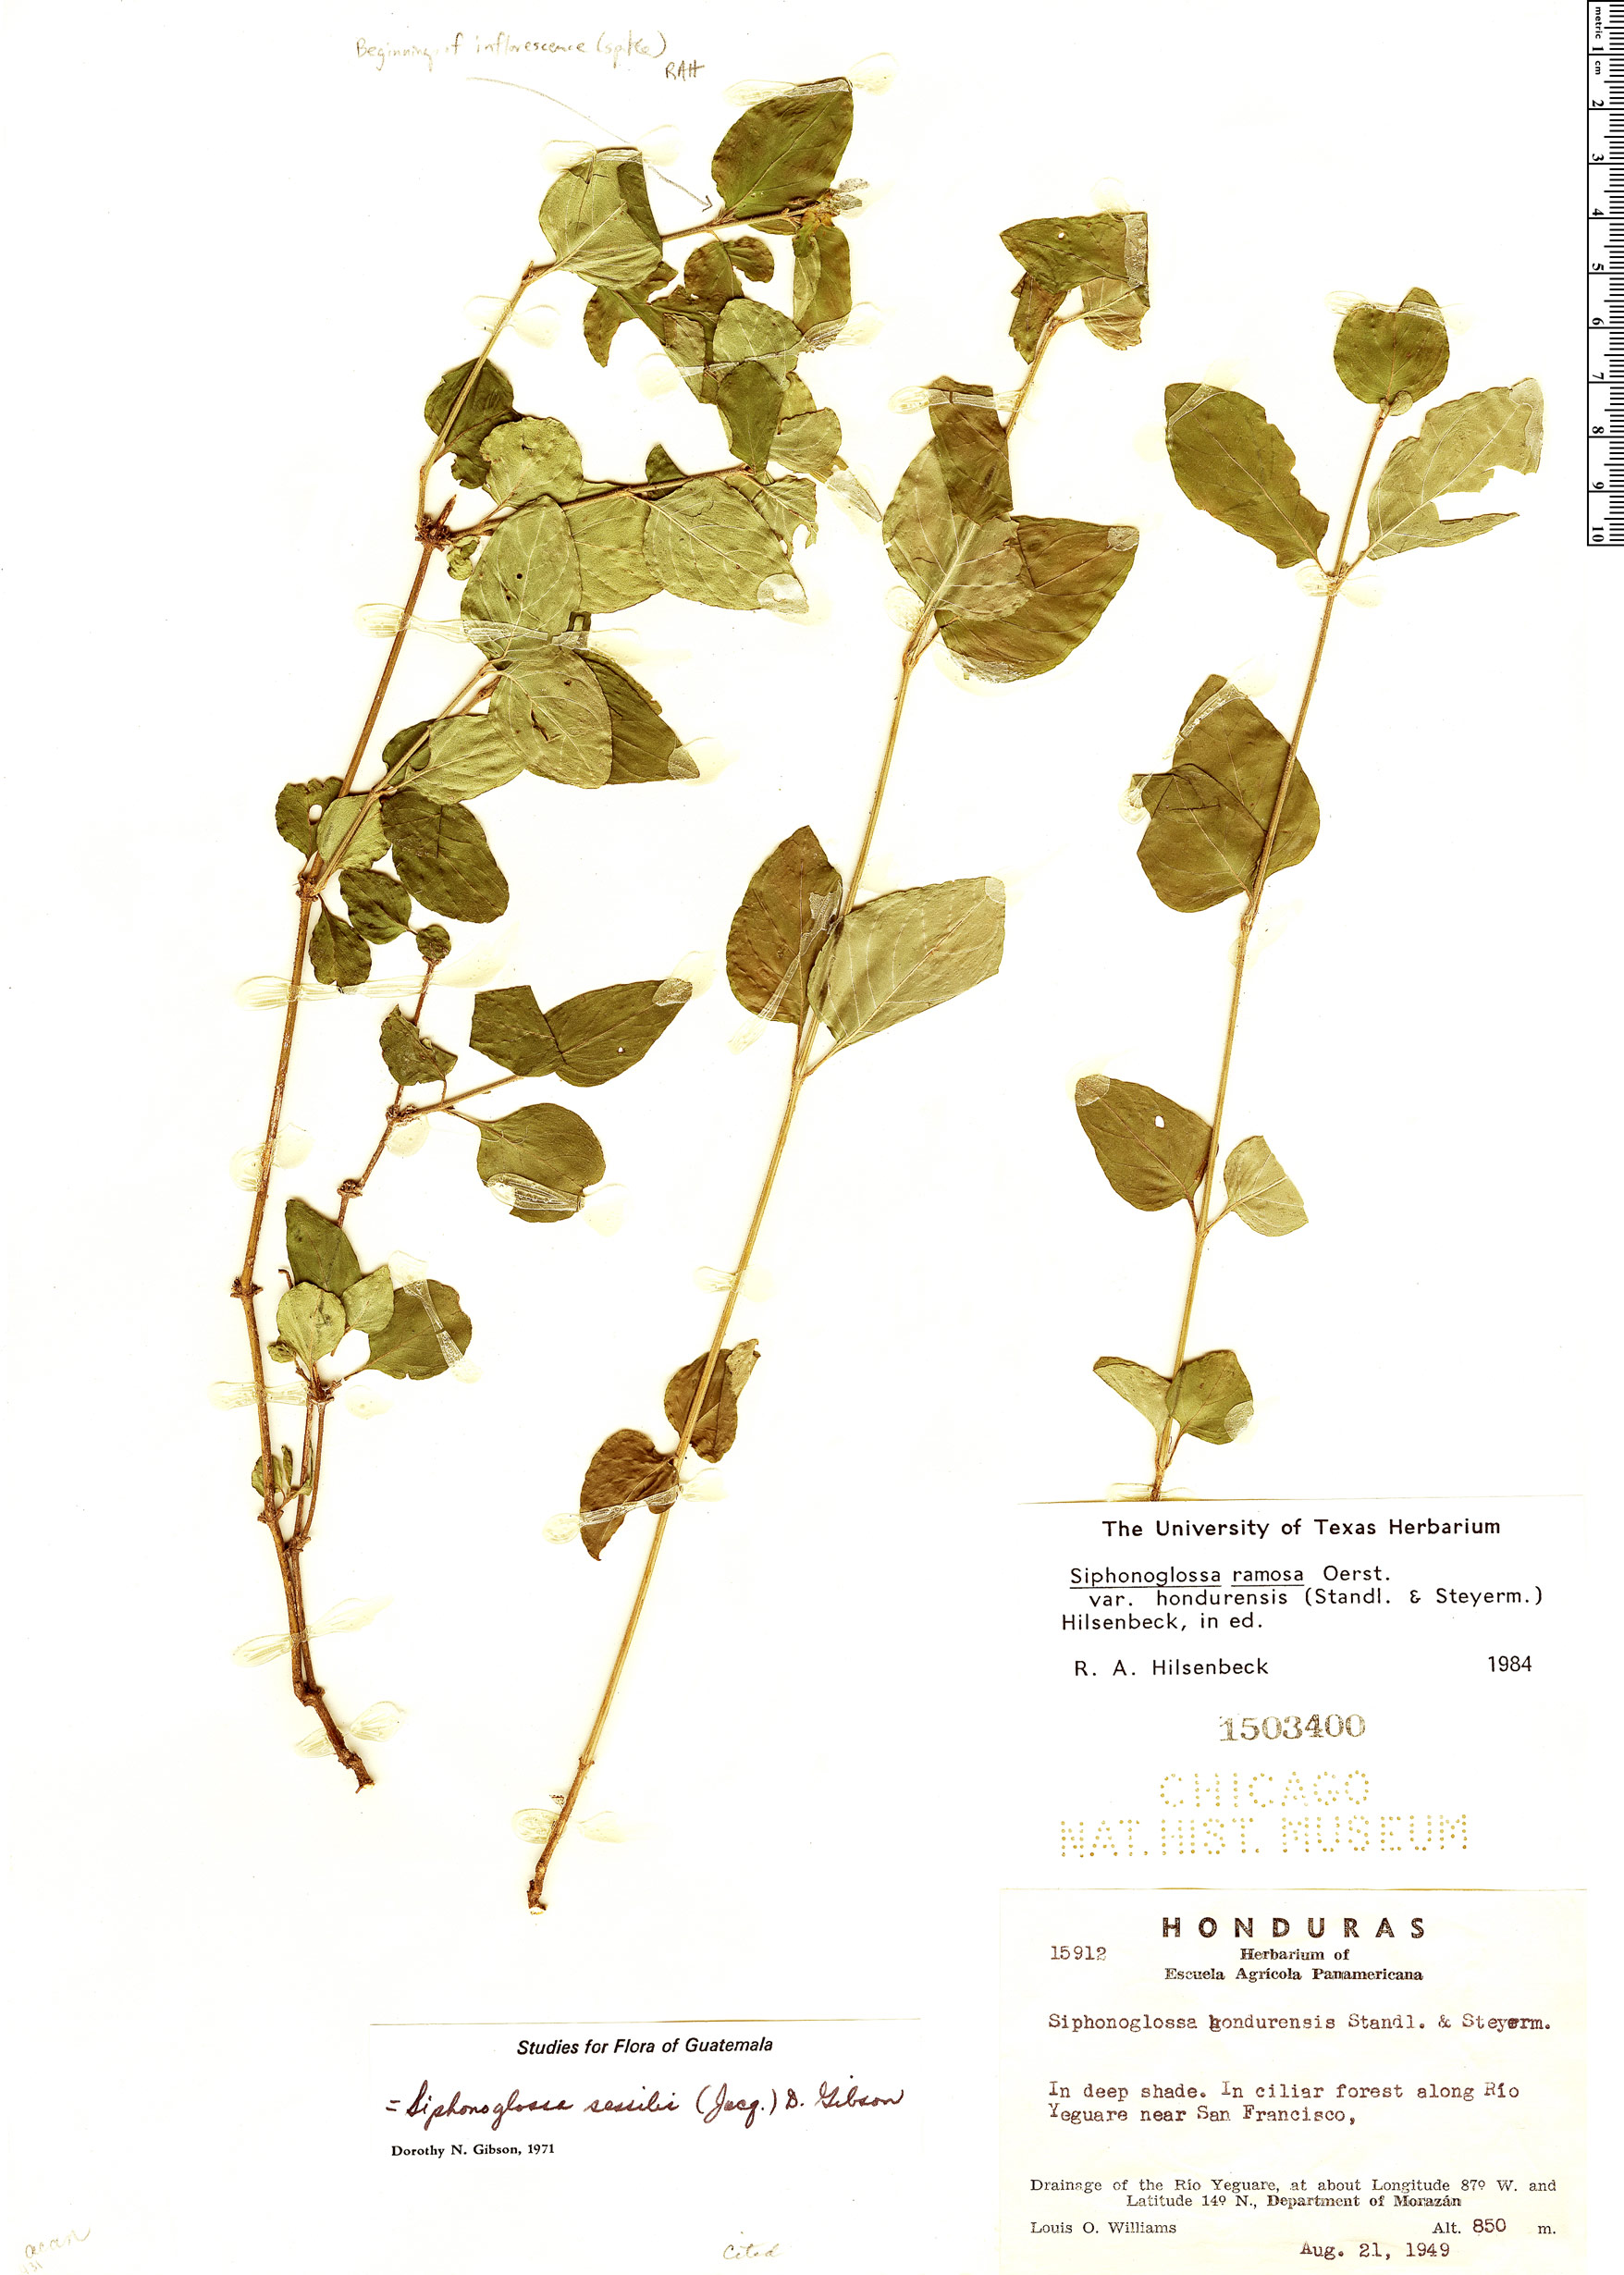 Espécimen: Siphonoglossa ramosa